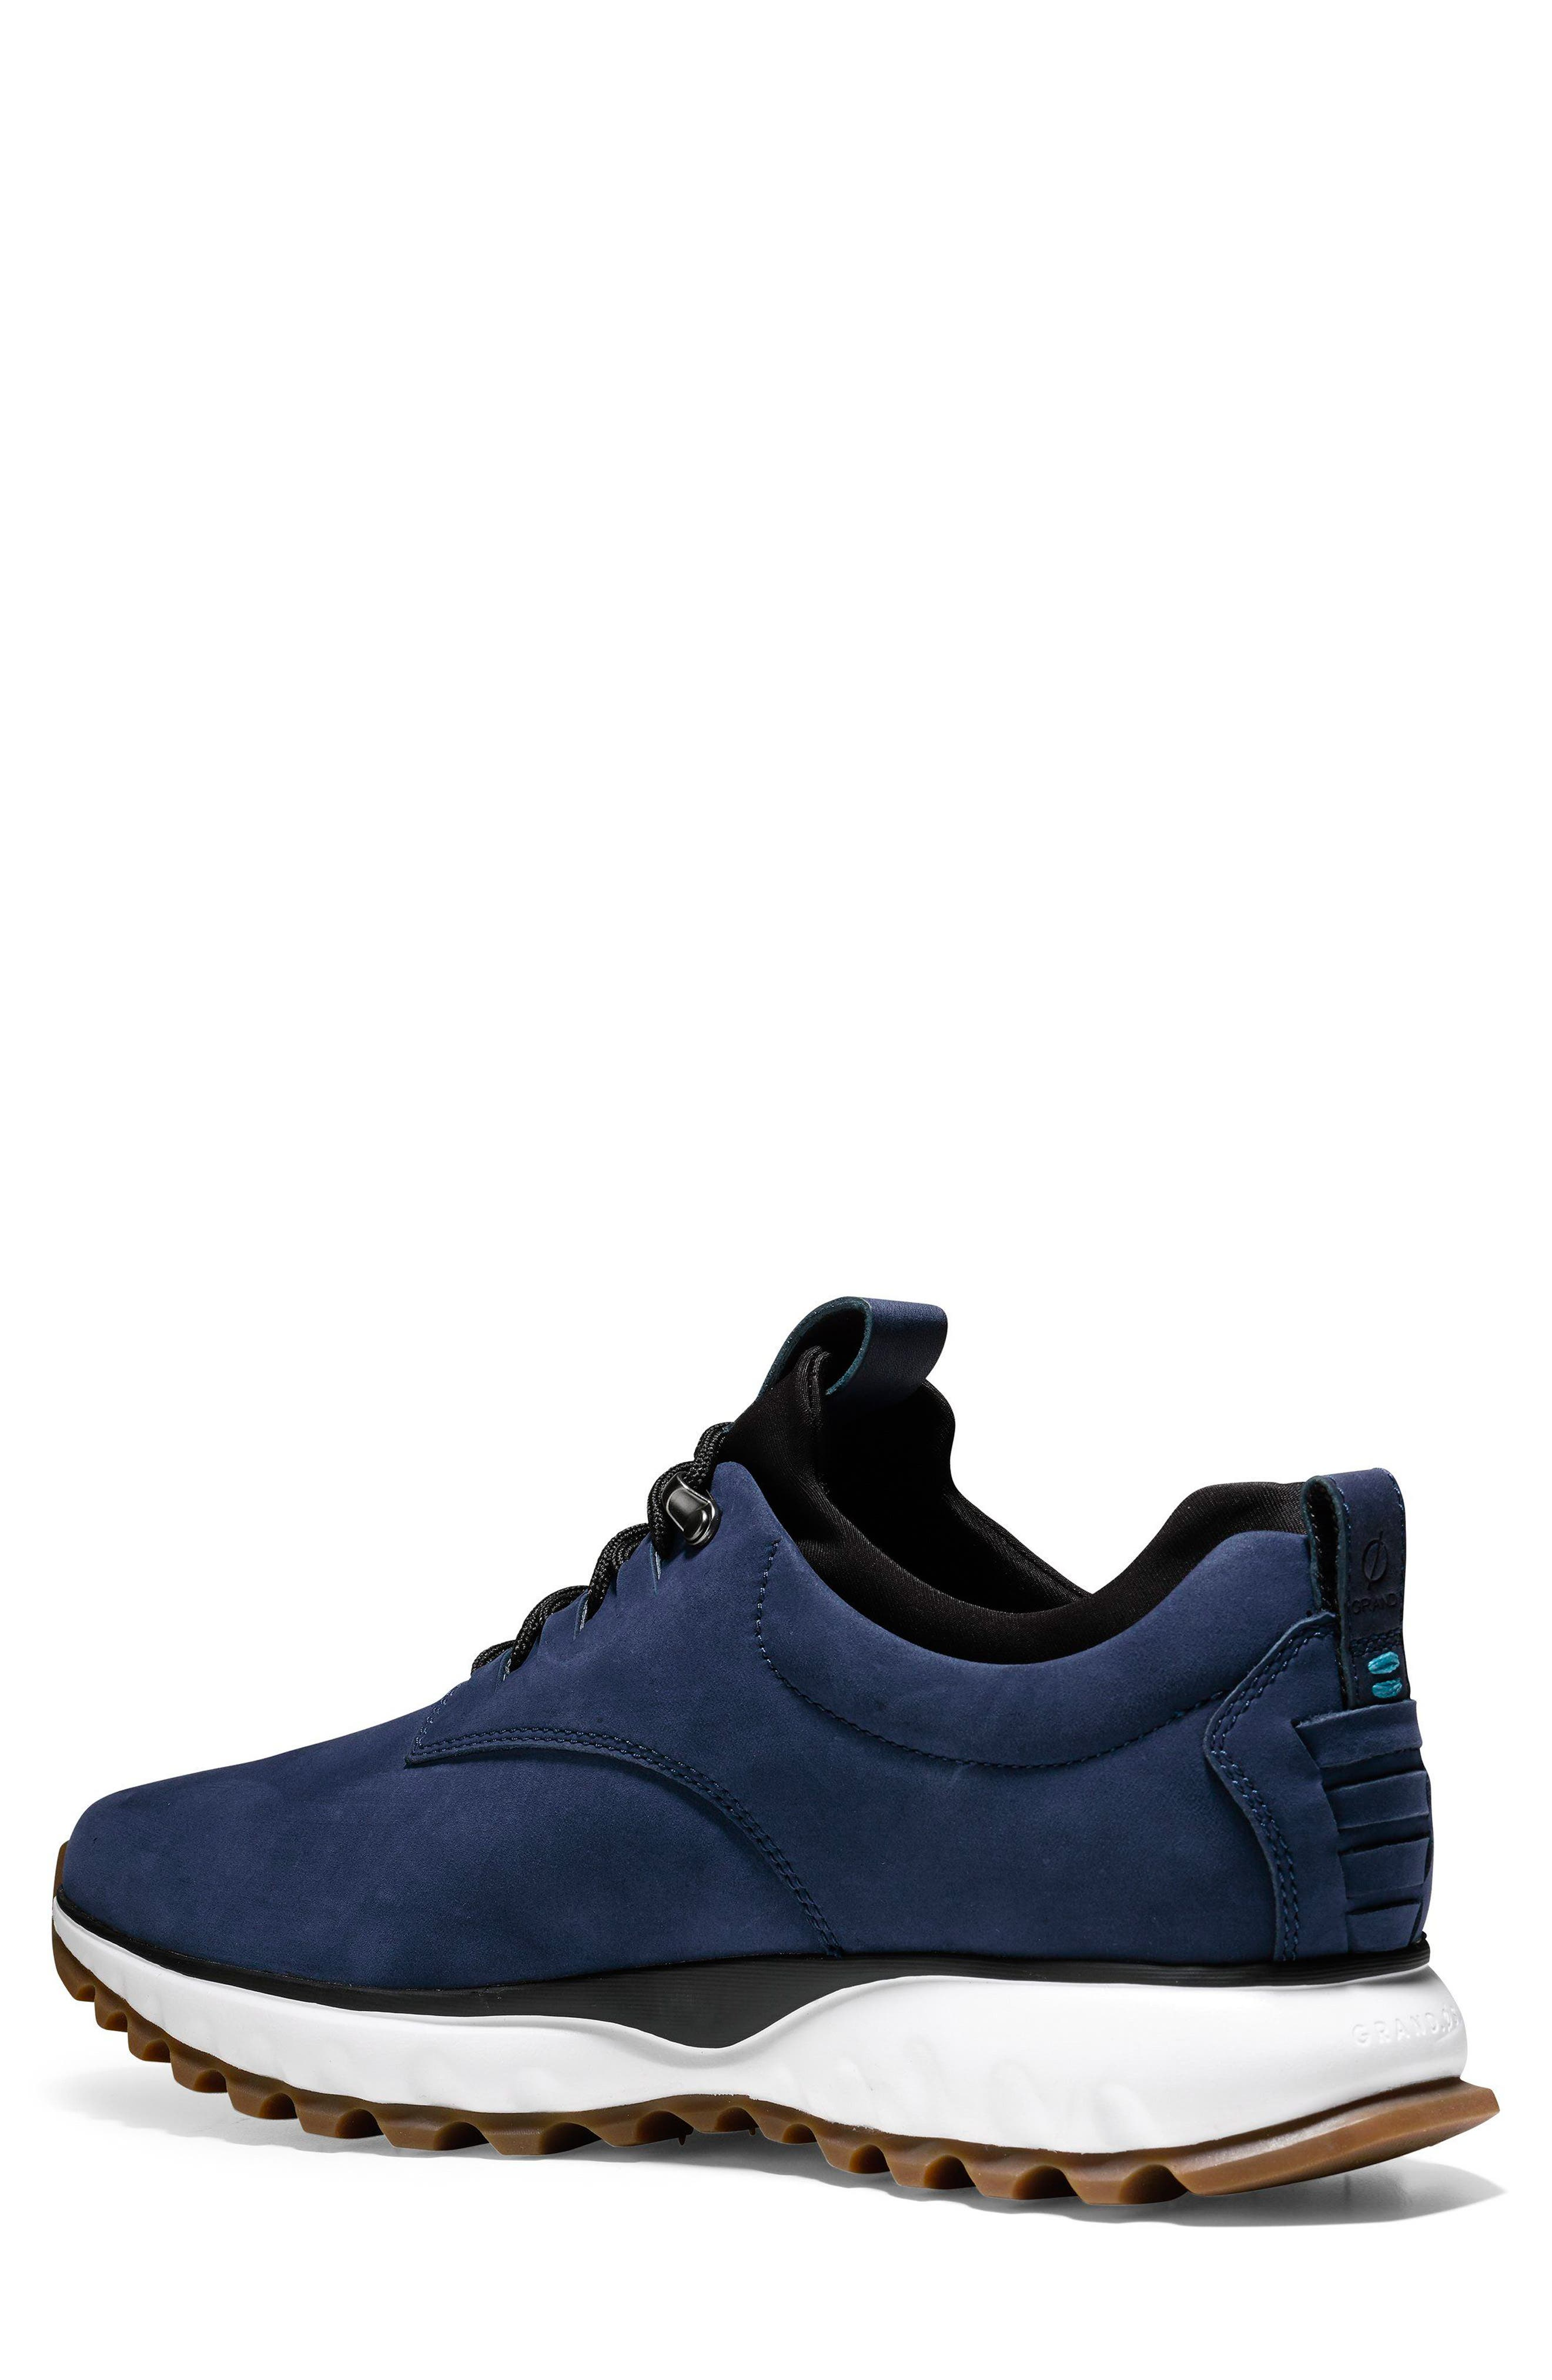 GrandExpløre All Terrain Waterproof Sneaker,                             Alternate thumbnail 2, color,                             Marine Blue Nubuck